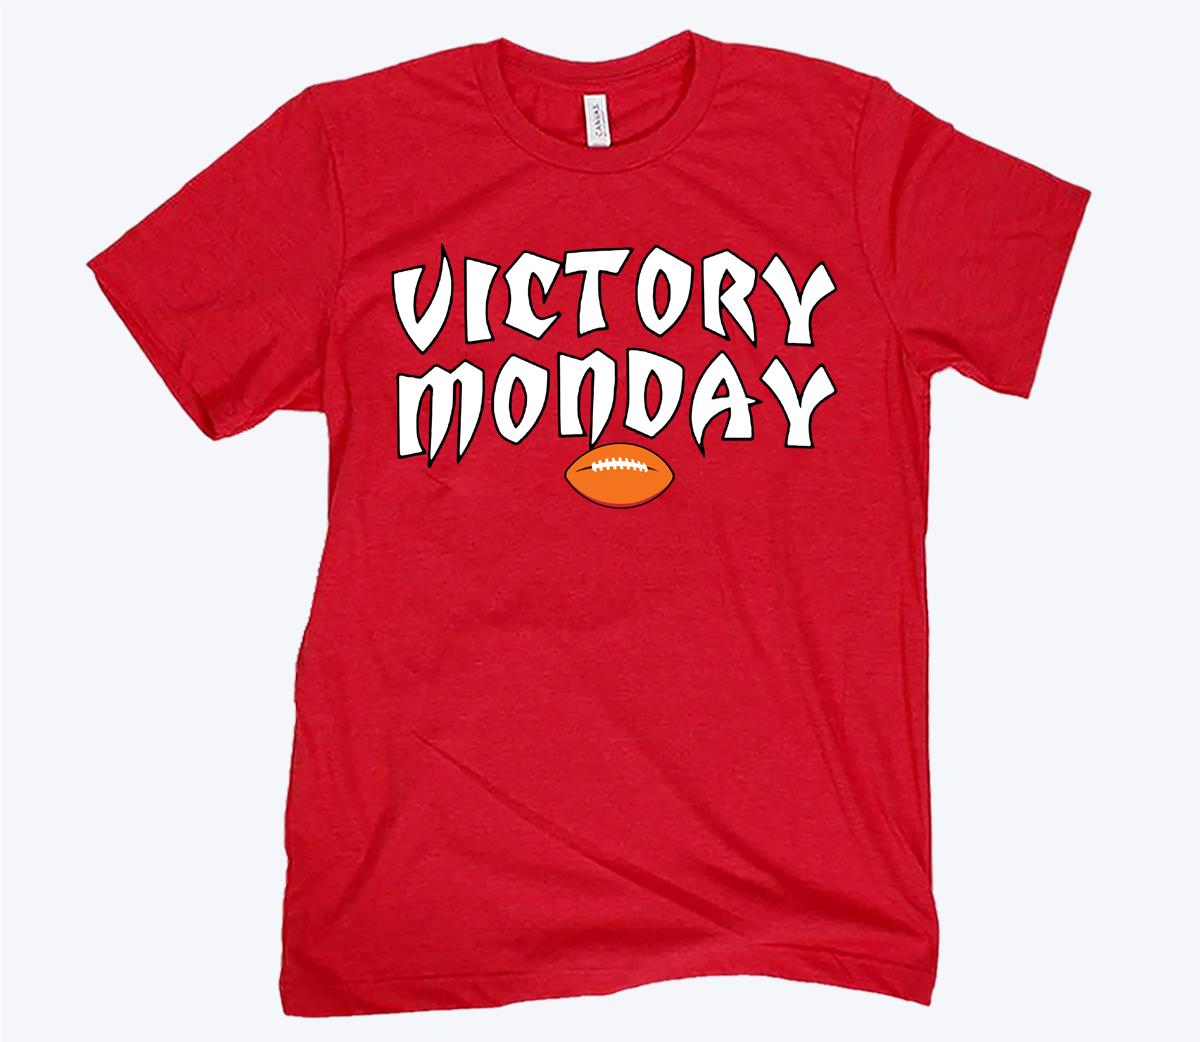 VICTORY MONDAY TB TEE SHIRT